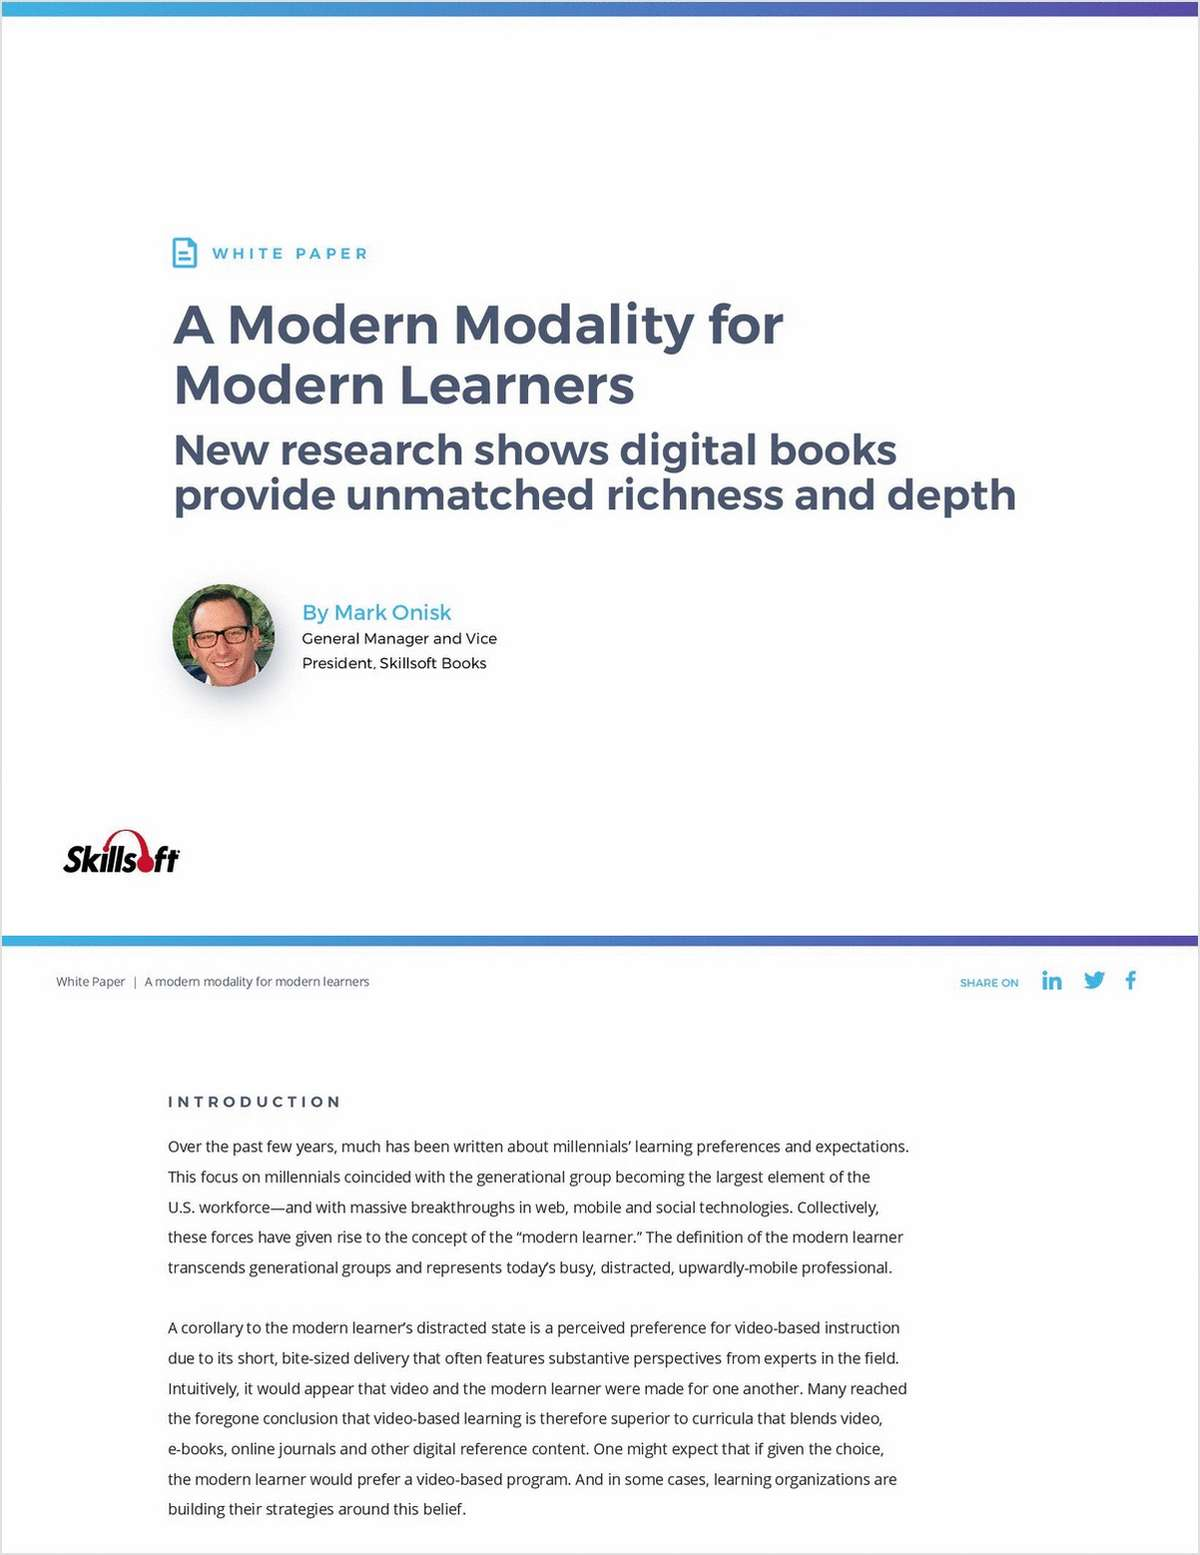 Digital Books: A Modern Modality for Modern Learners